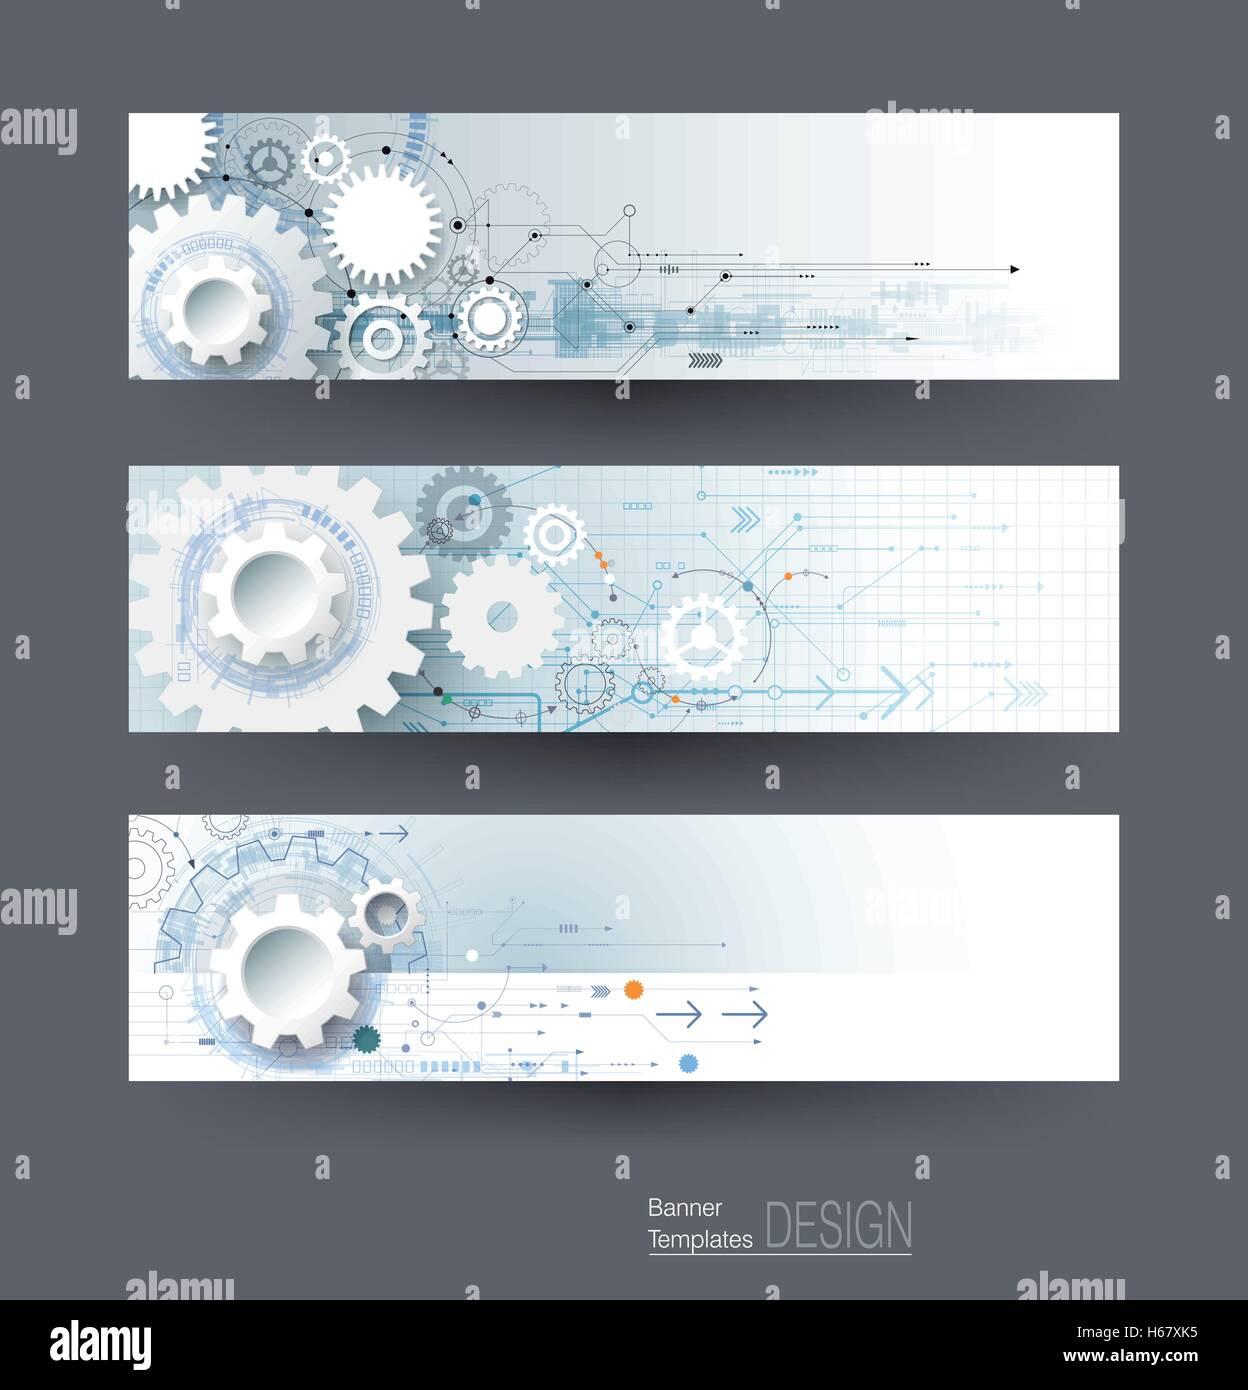 Engineer Business Card Template Gear Stock Photos & Engineer ...